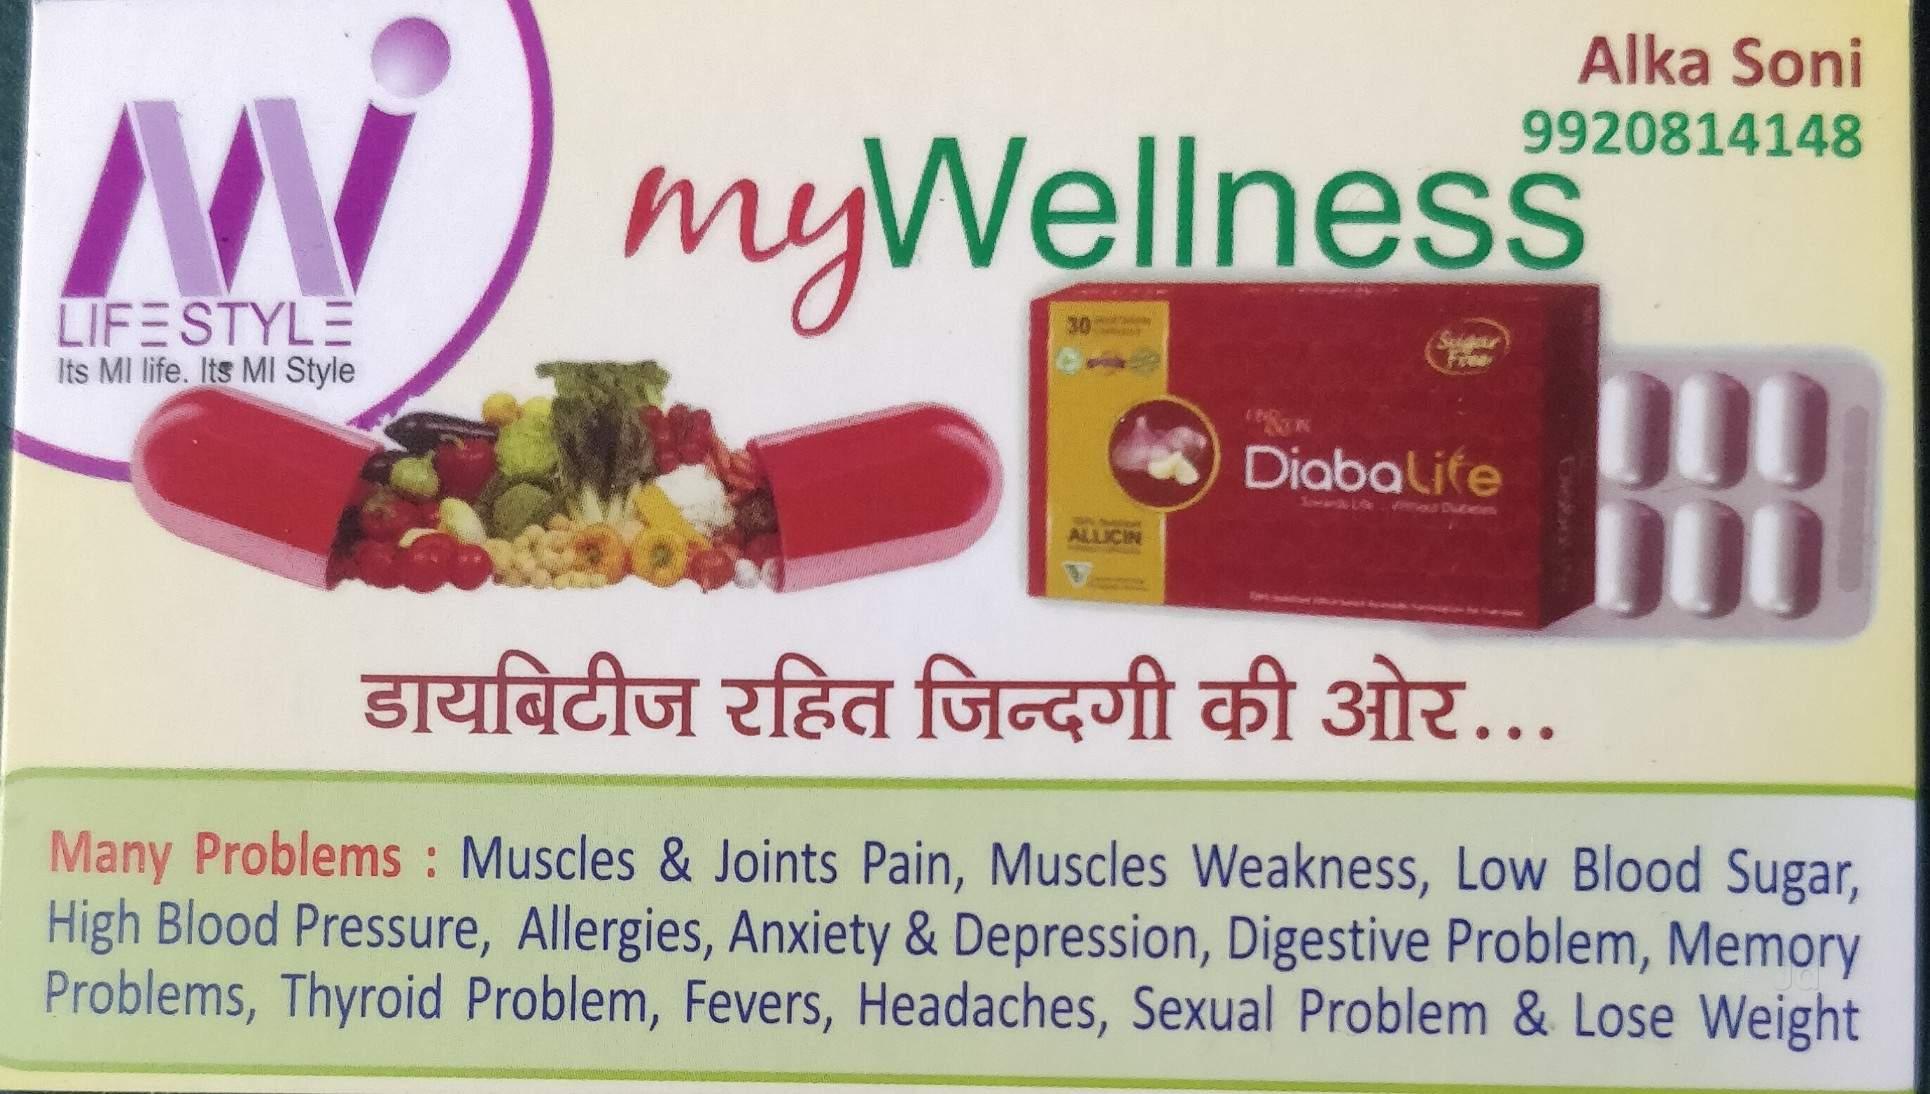 Top 30 Ayurvedic Medicine Shops in Powai - Best Ayurvedic Pharmacy